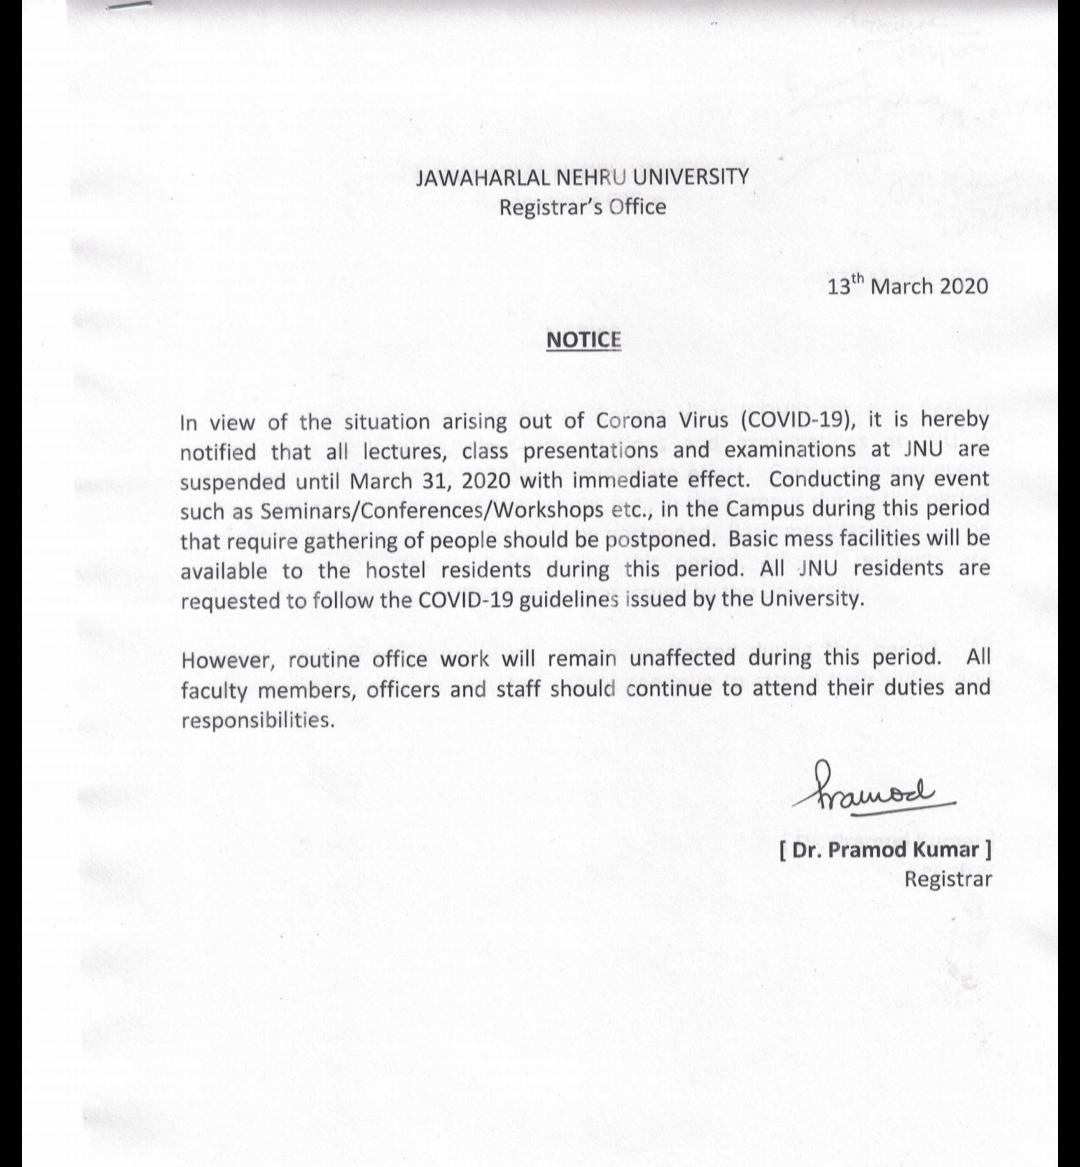 Coronavirus Covid 19 India Highlights Google Bangalore Employee Tests Positive For Coronavirus Rupee Hits Record Low